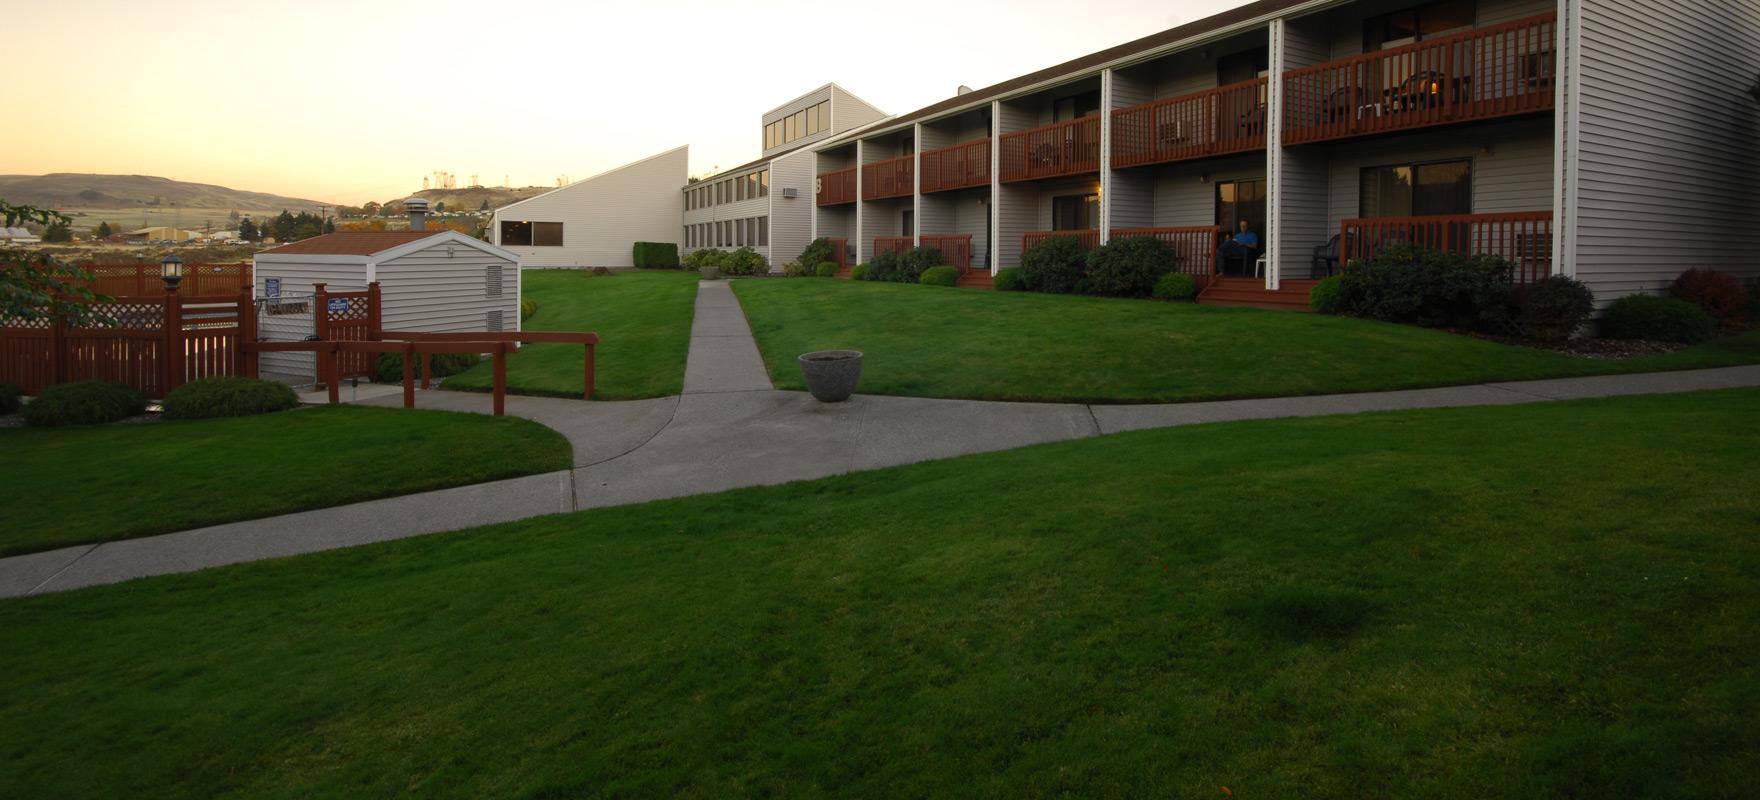 Shilo Inns Suites Hotels - Boise bwin werbung bwin Live-Fußballergebnisse Airport | Idaho